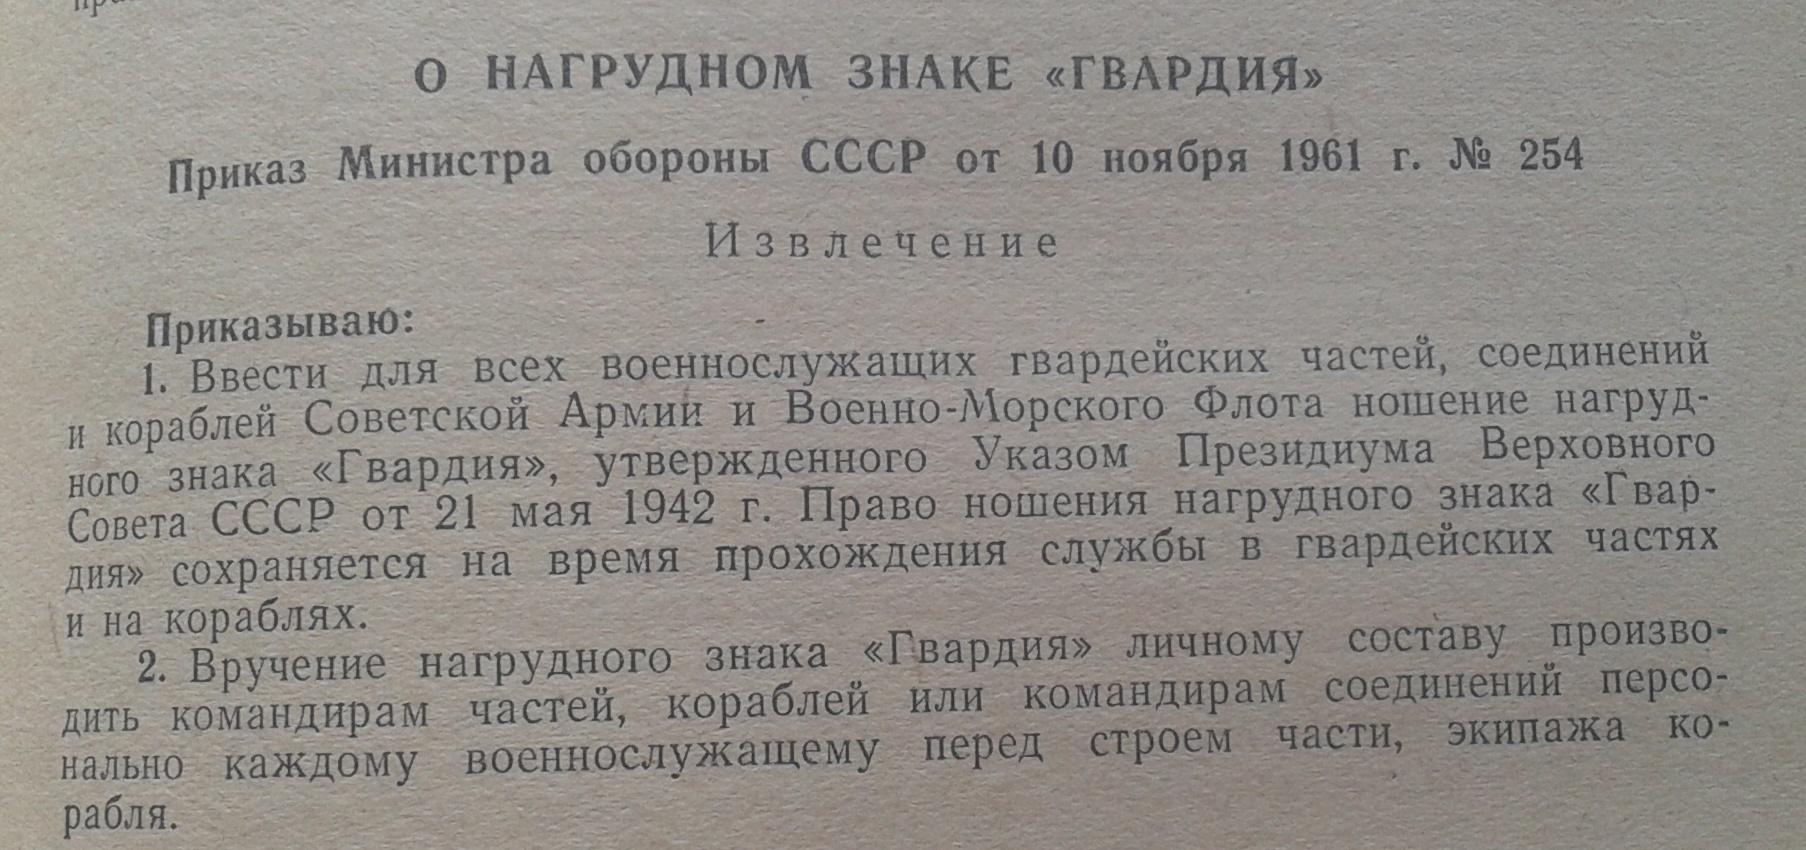 http://s4.uploads.ru/LCN06.jpg